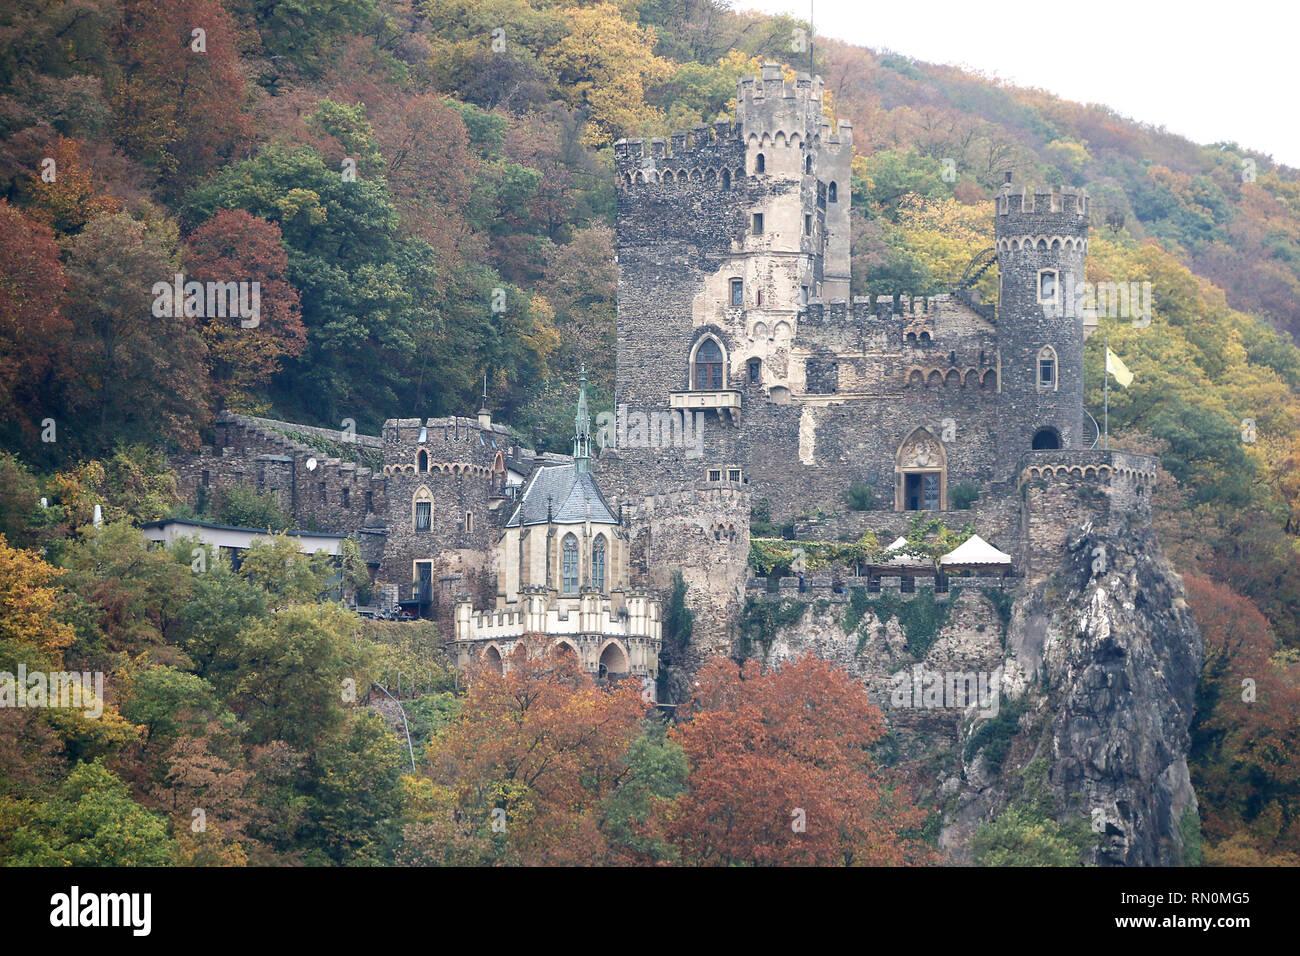 Romantik-Schloß Burg Rheinstein, Germany - Stock Image